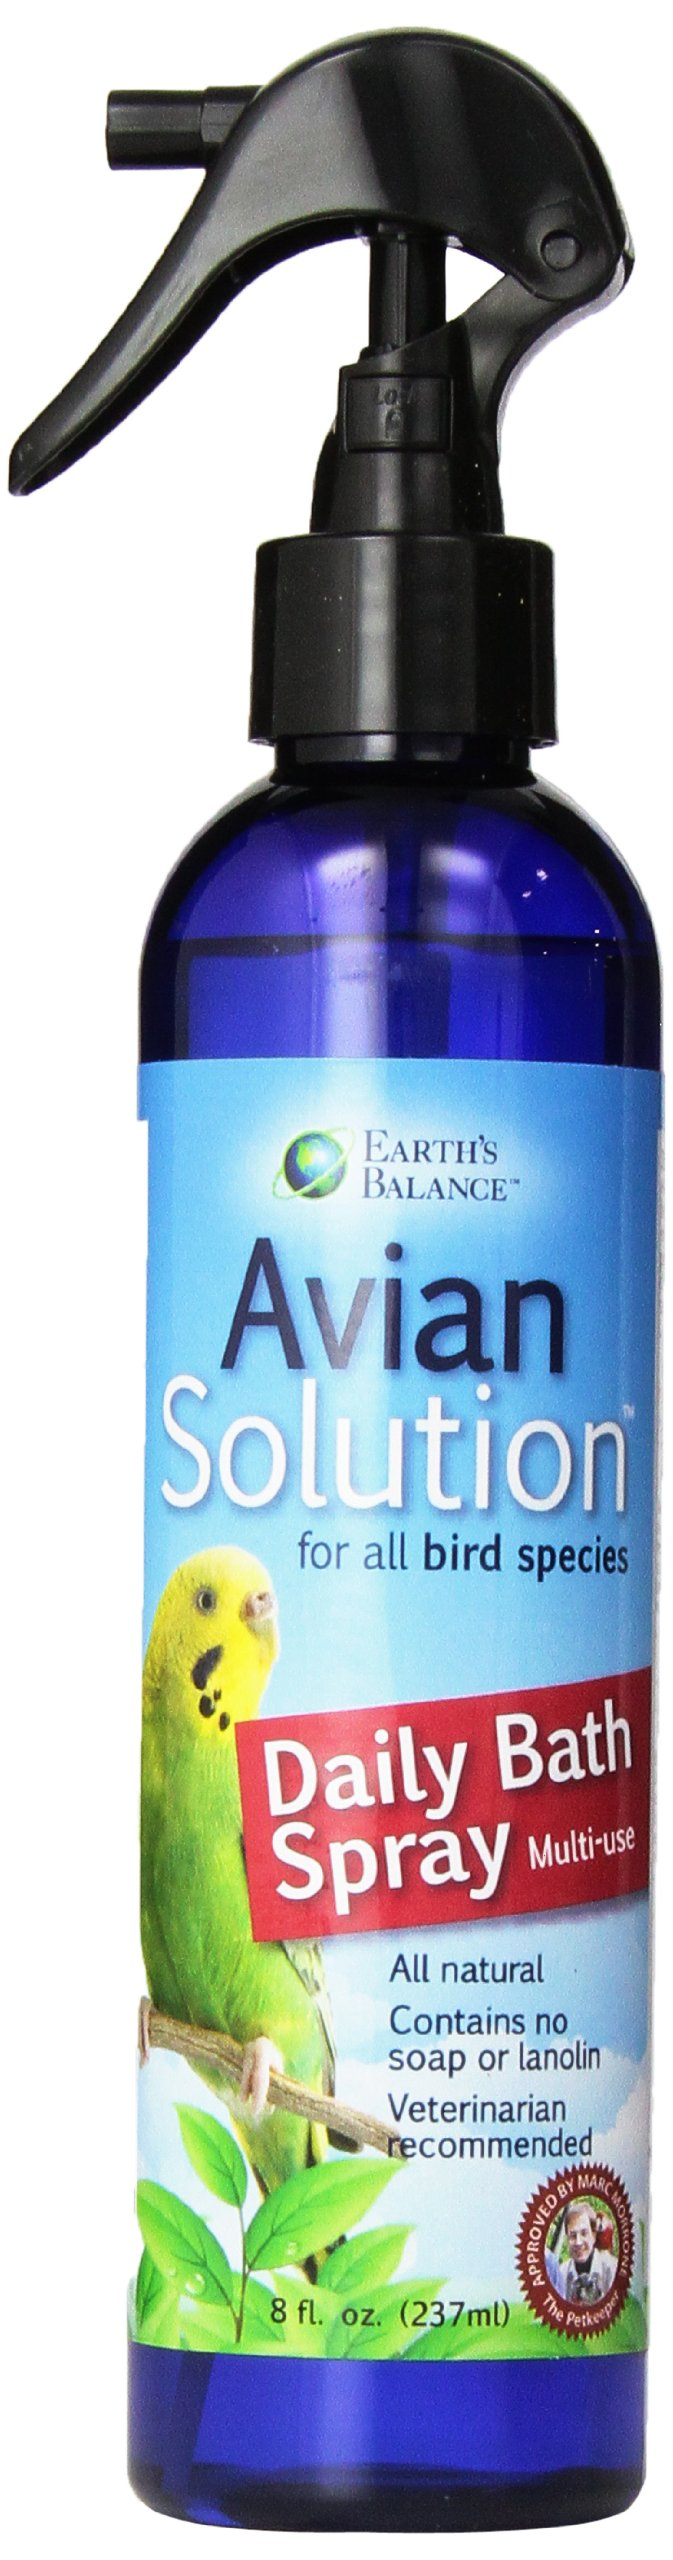 Earth's Balance Avian Solution, 8-Ounce by Earth's Balance